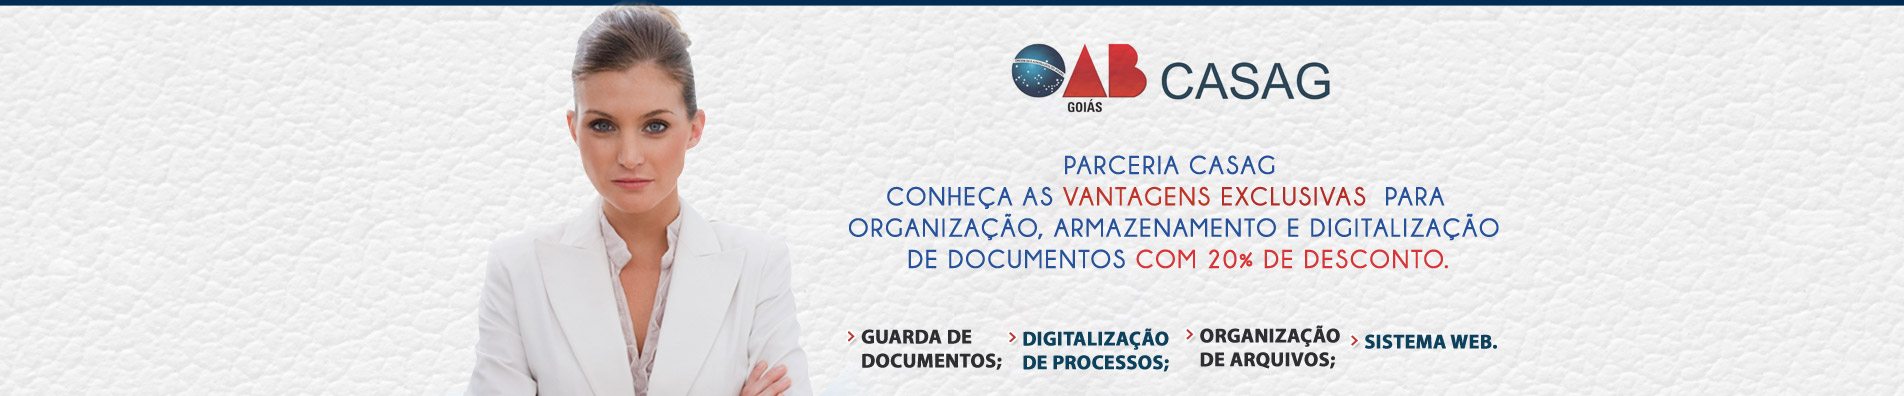 site-oa2b